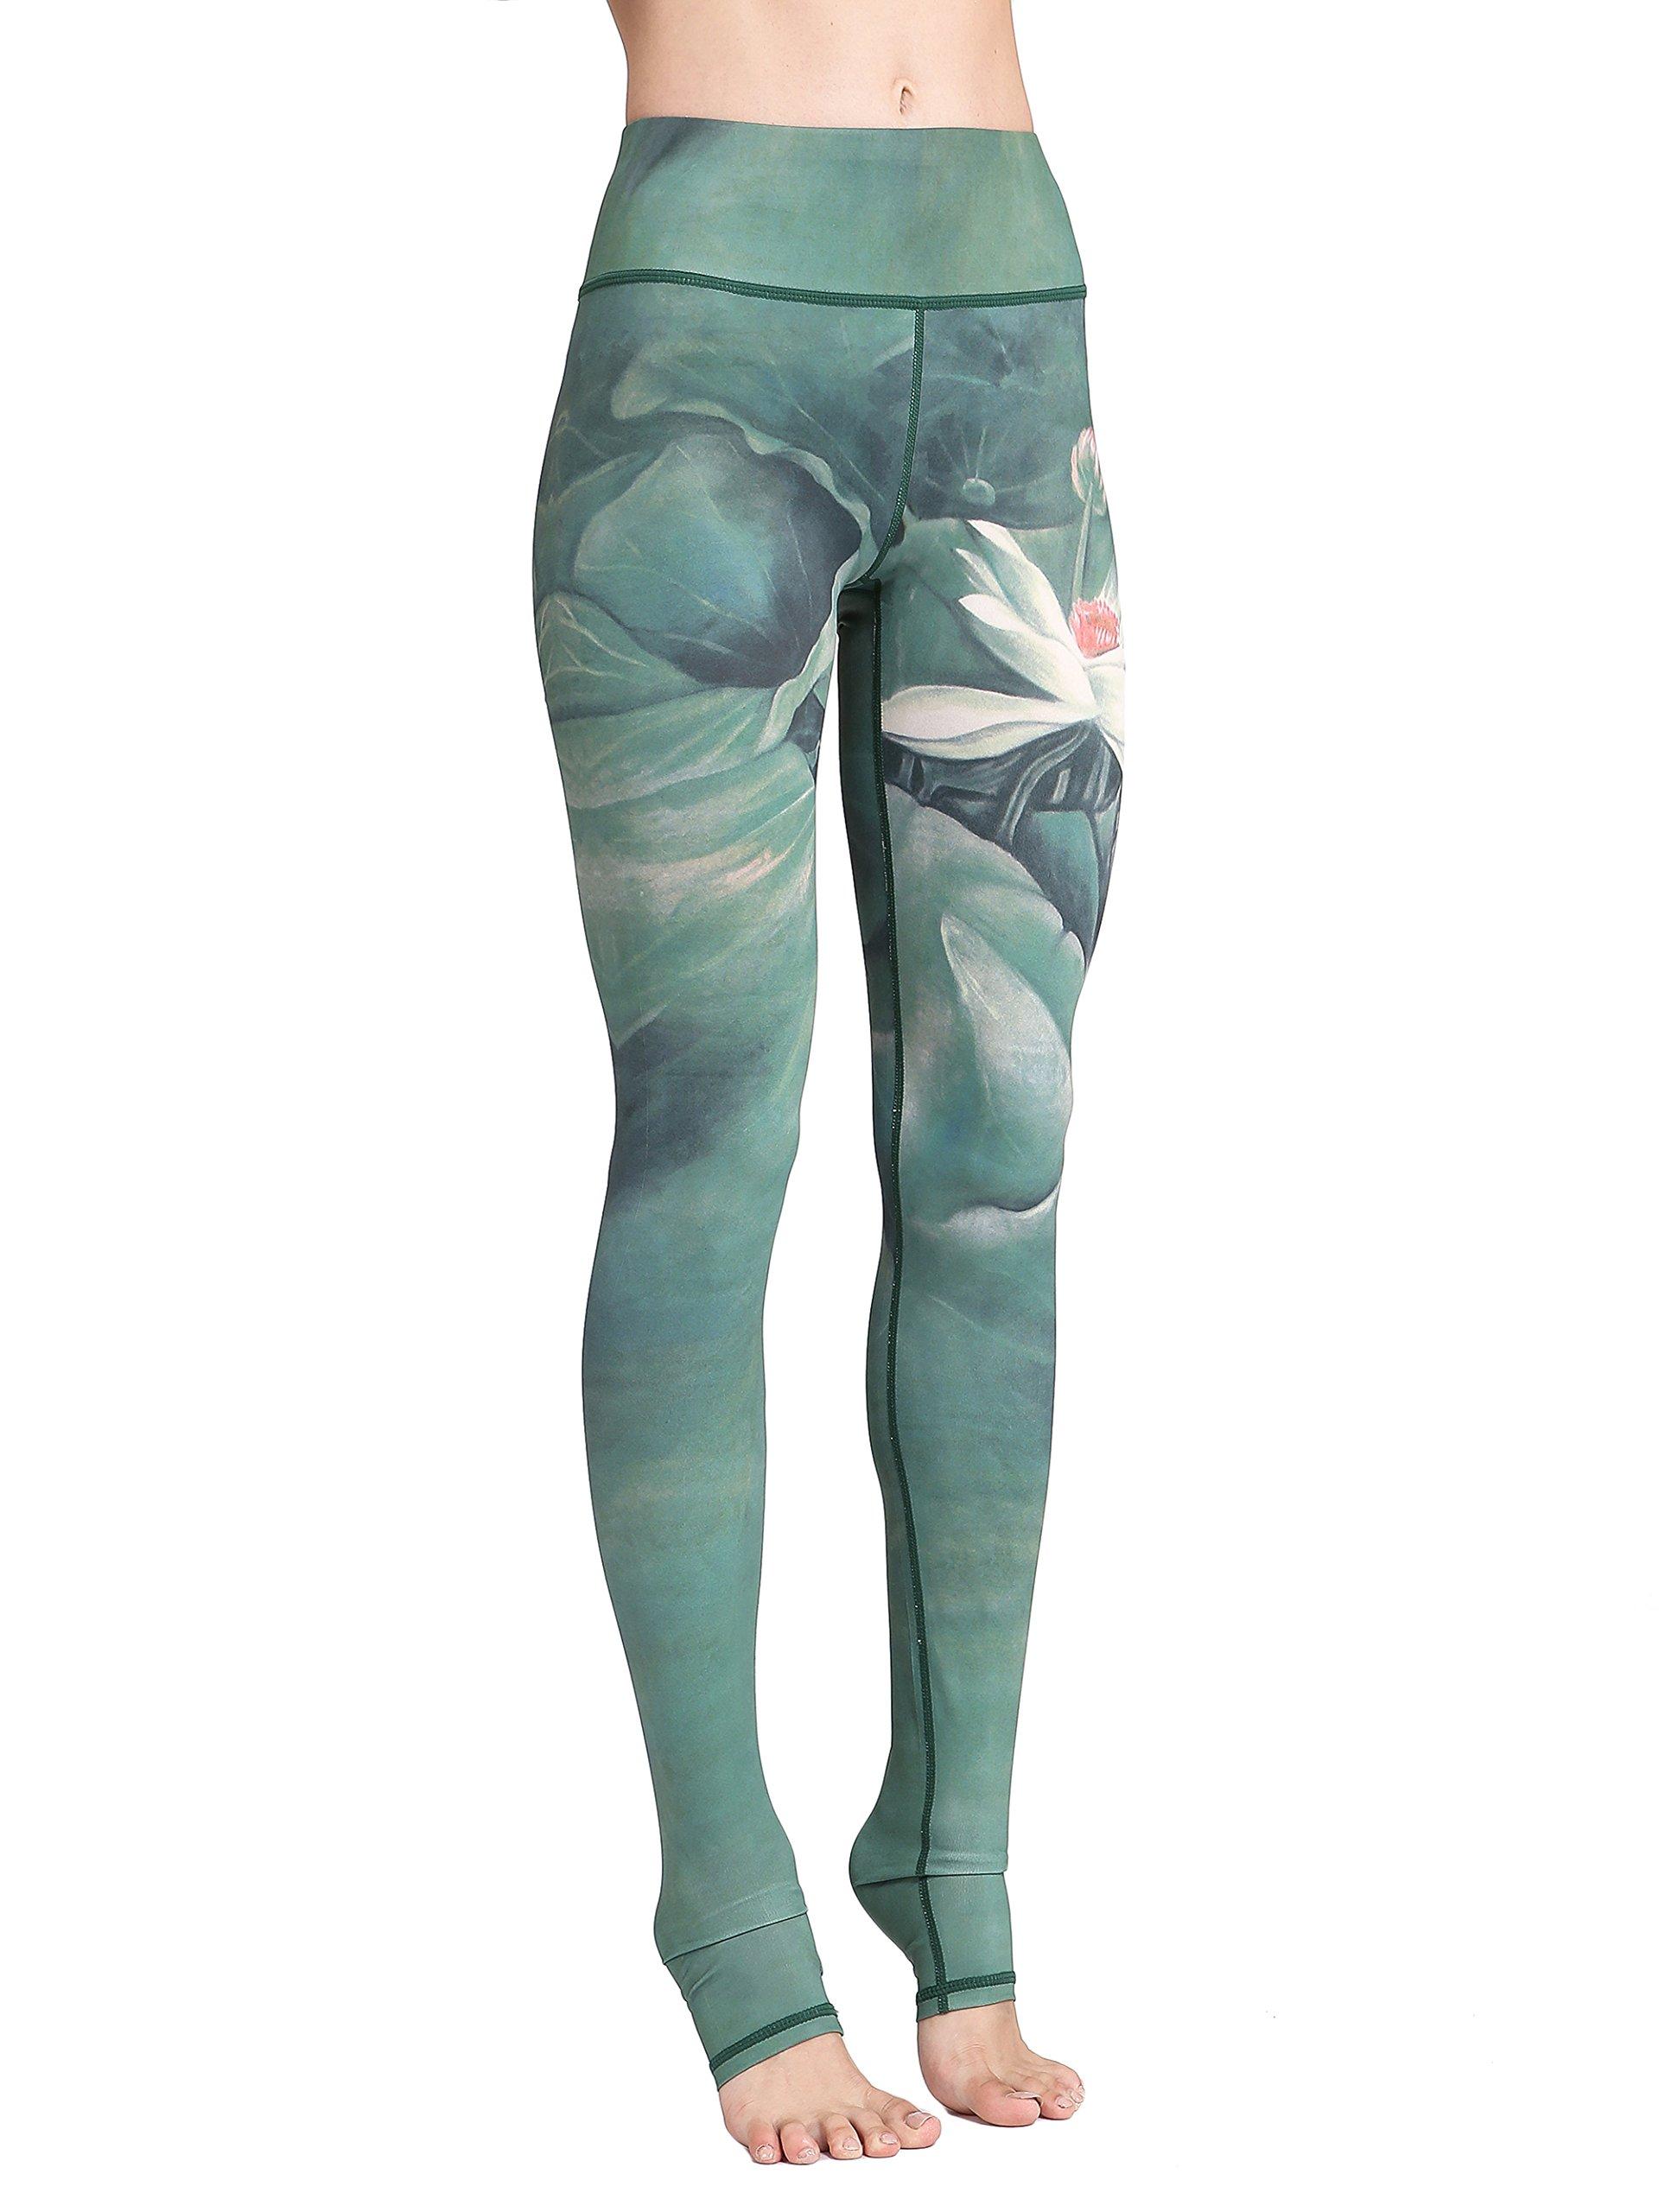 b4a2416725 81%2BmoMEycuL - FLYILY Women's Long Yoga Pants Sports Leggings Running  Tights High Waist Stretch